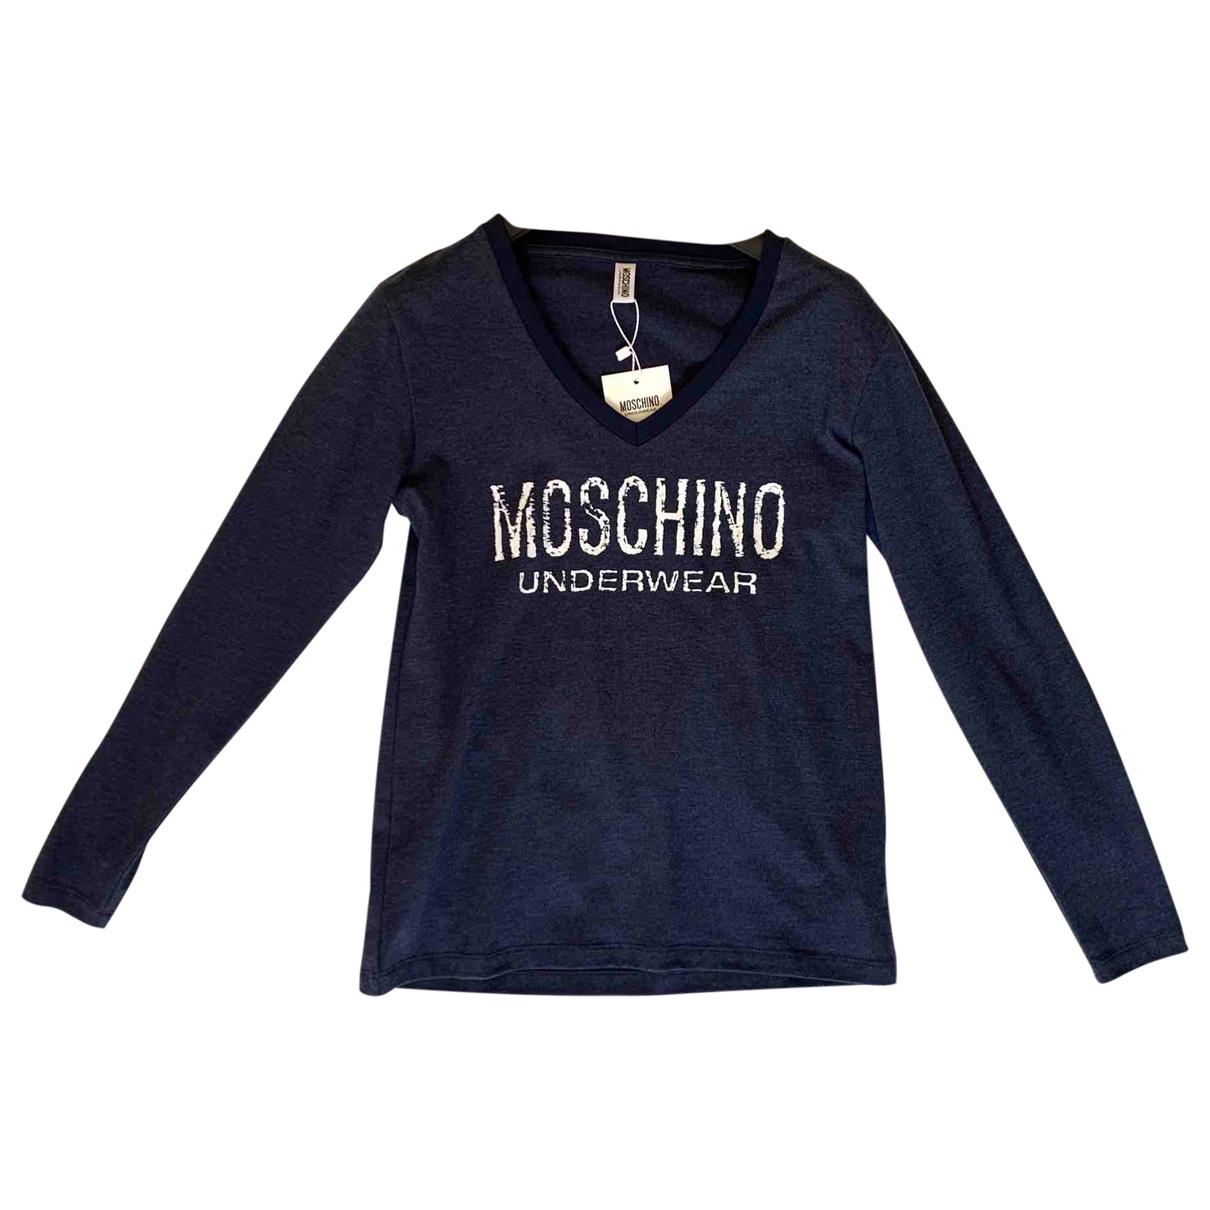 Moschino \N Blue Cotton  top for Women S International